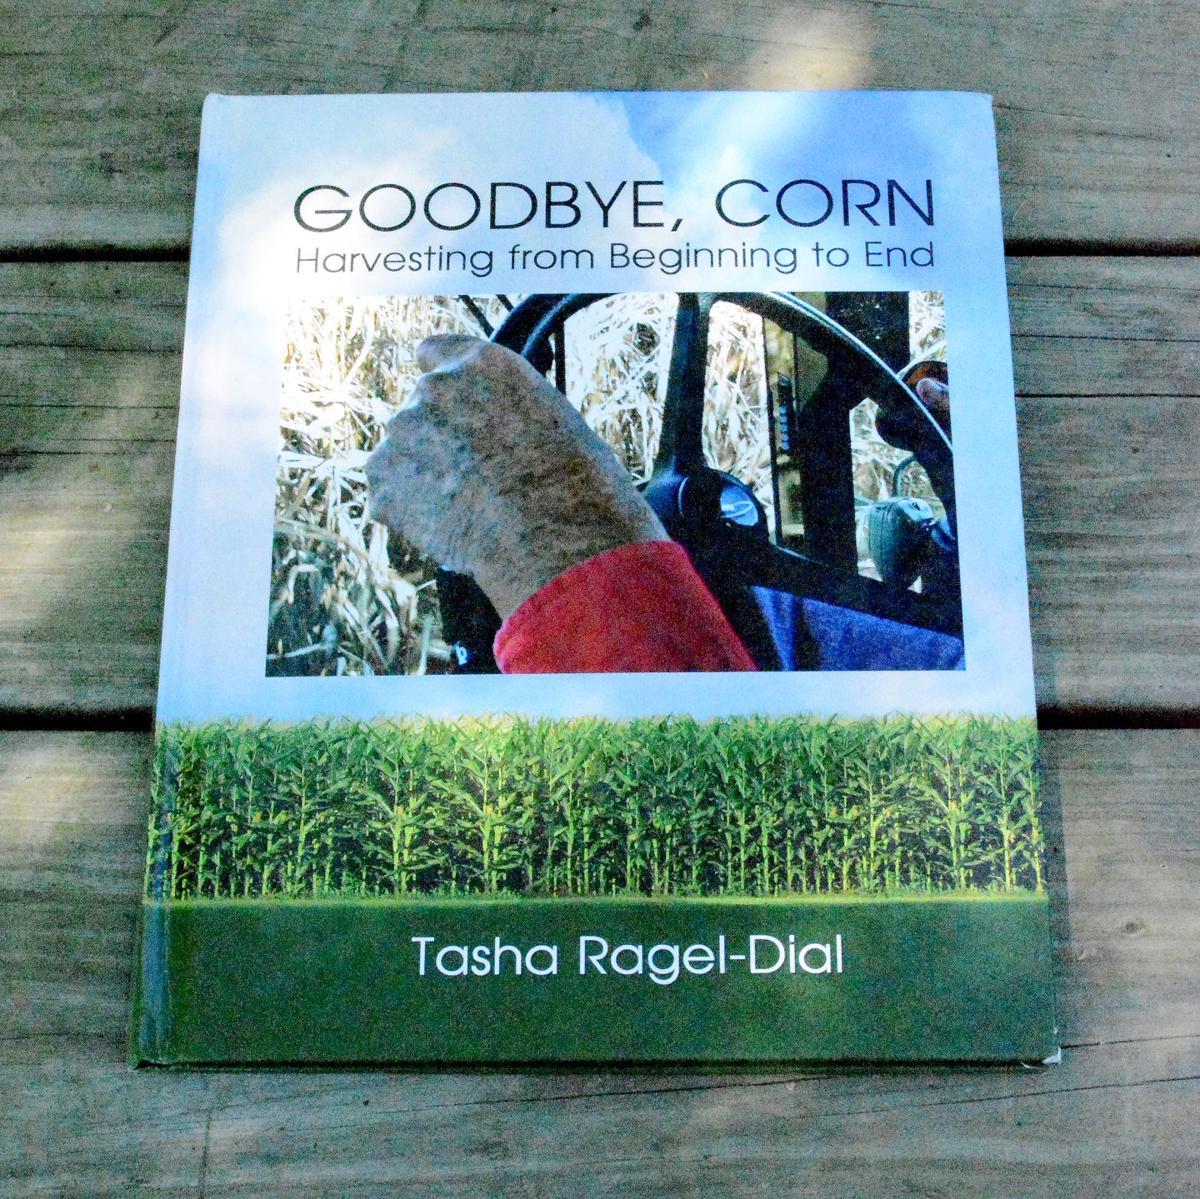 Tasha Ragel-Dial 2014 Book